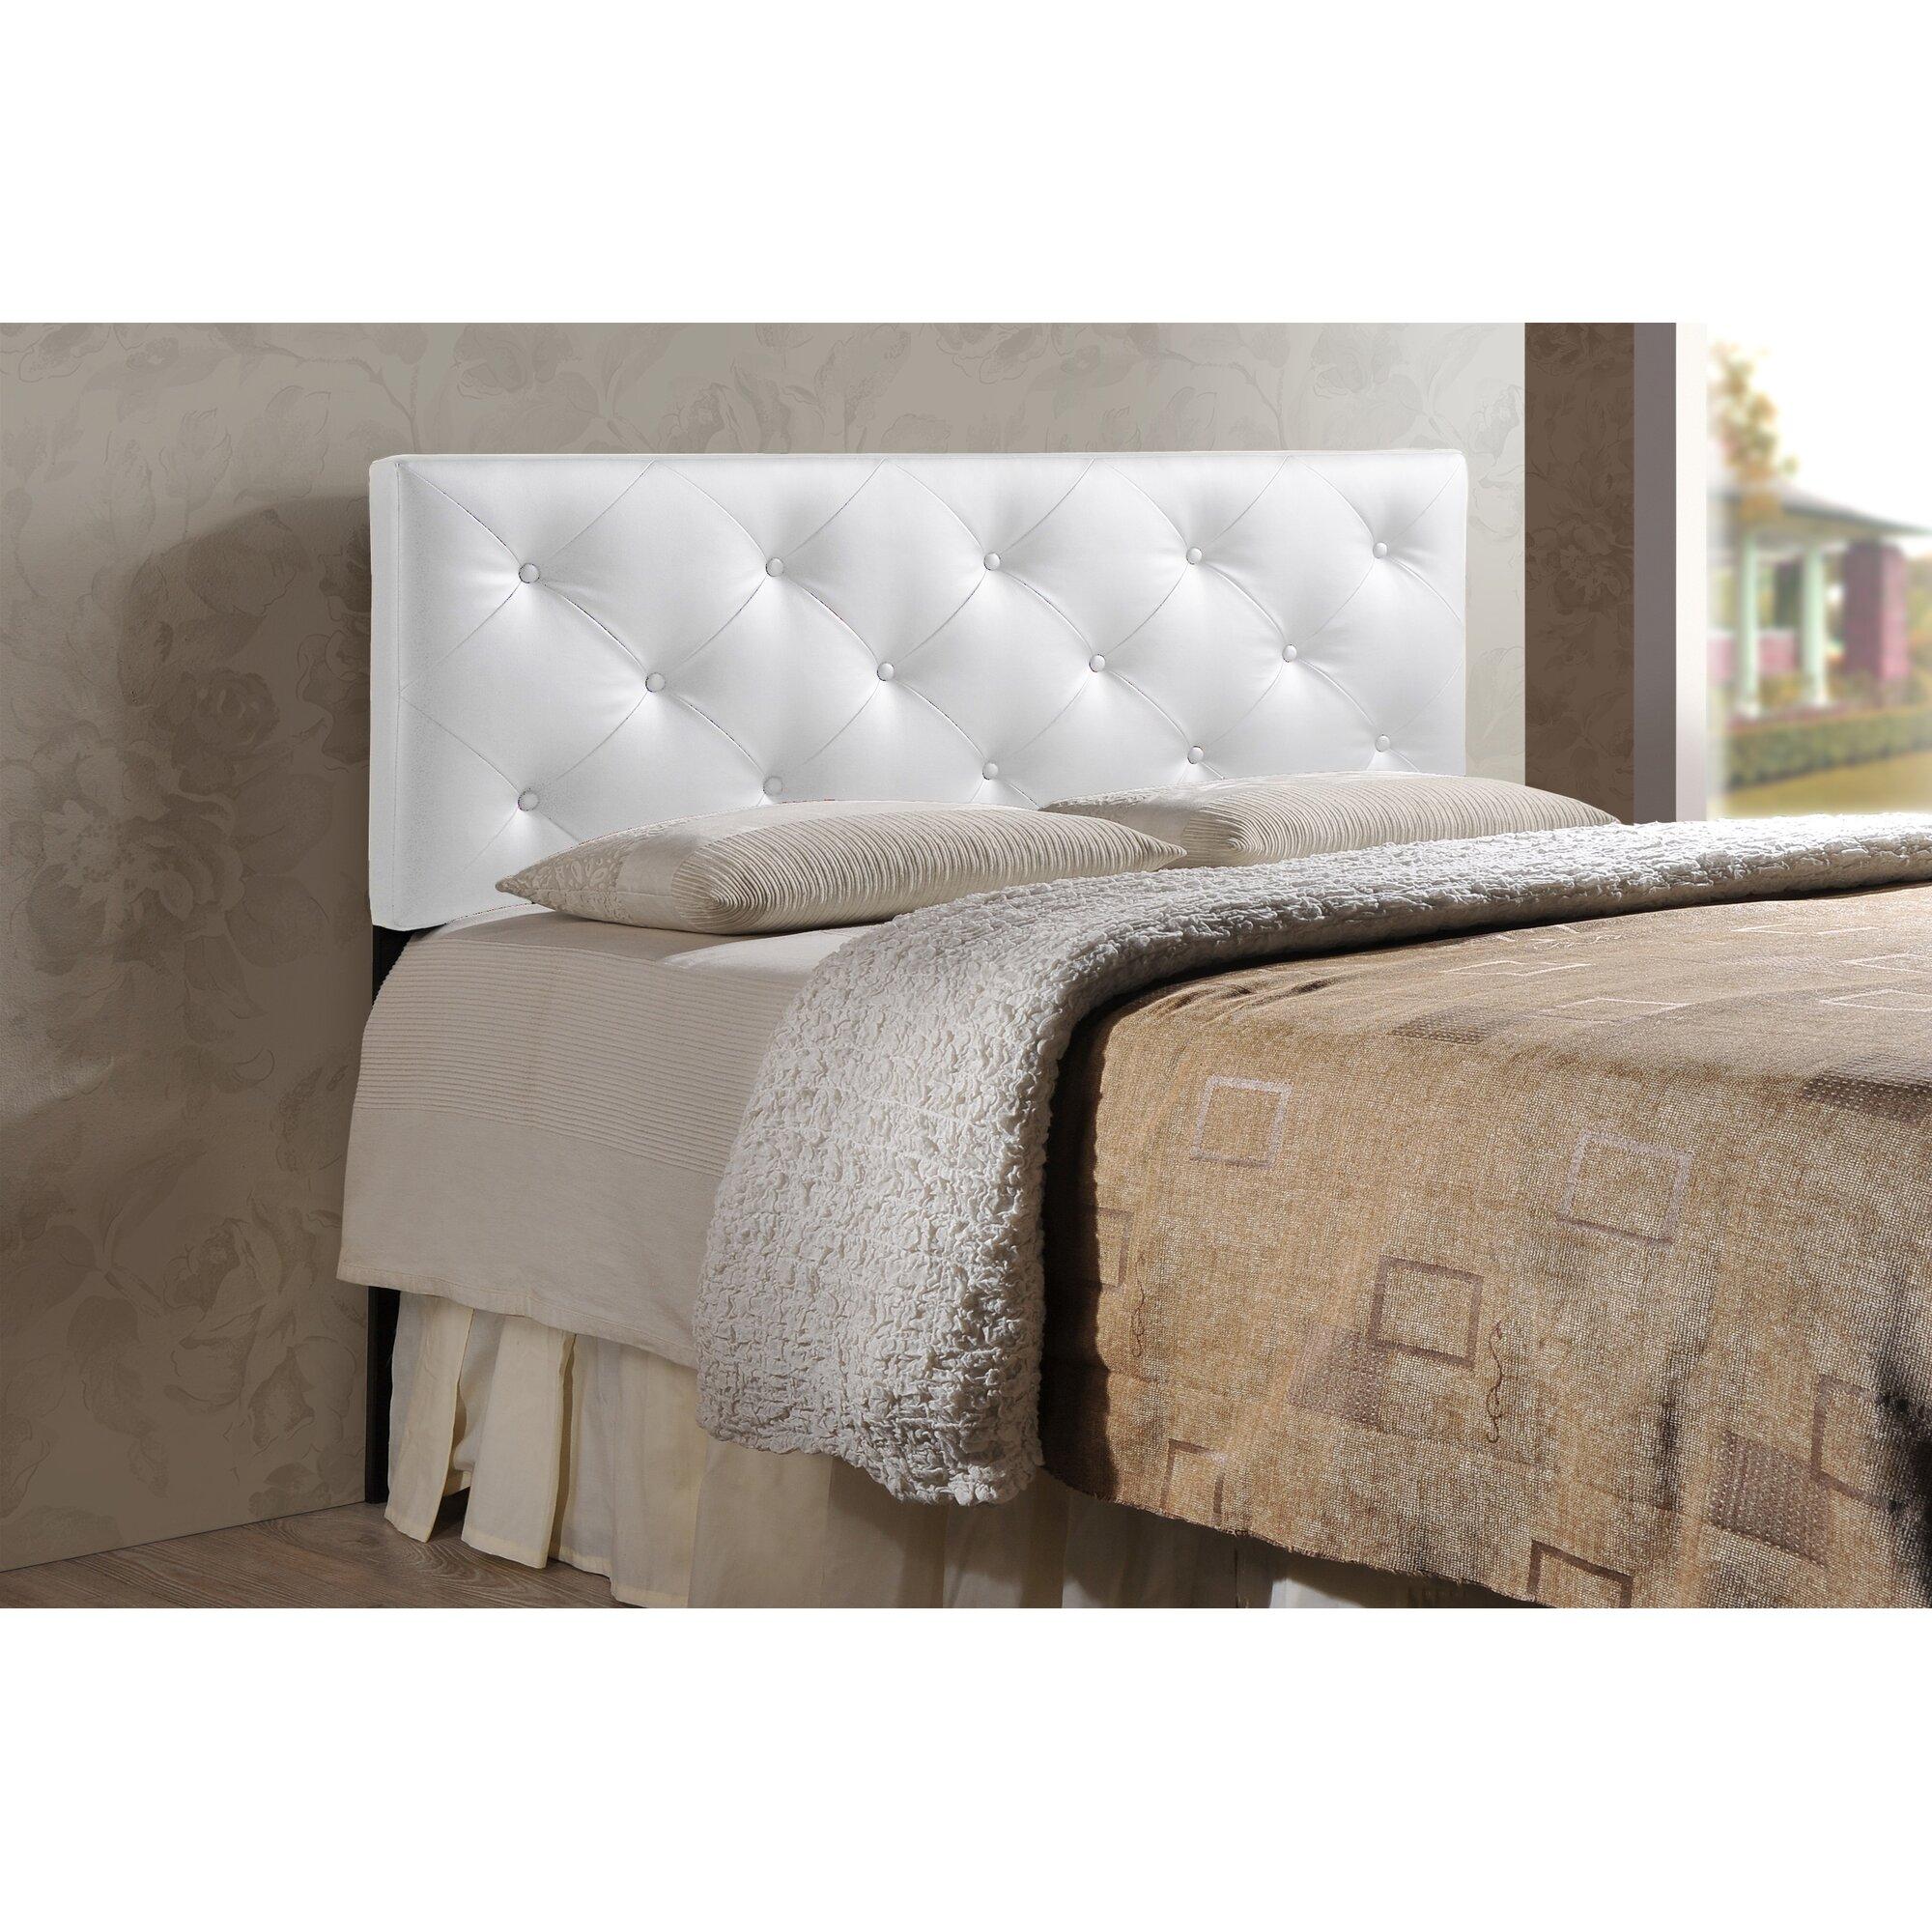 Bed headboard upholstered - Orlando Upholstered Panel Headboard